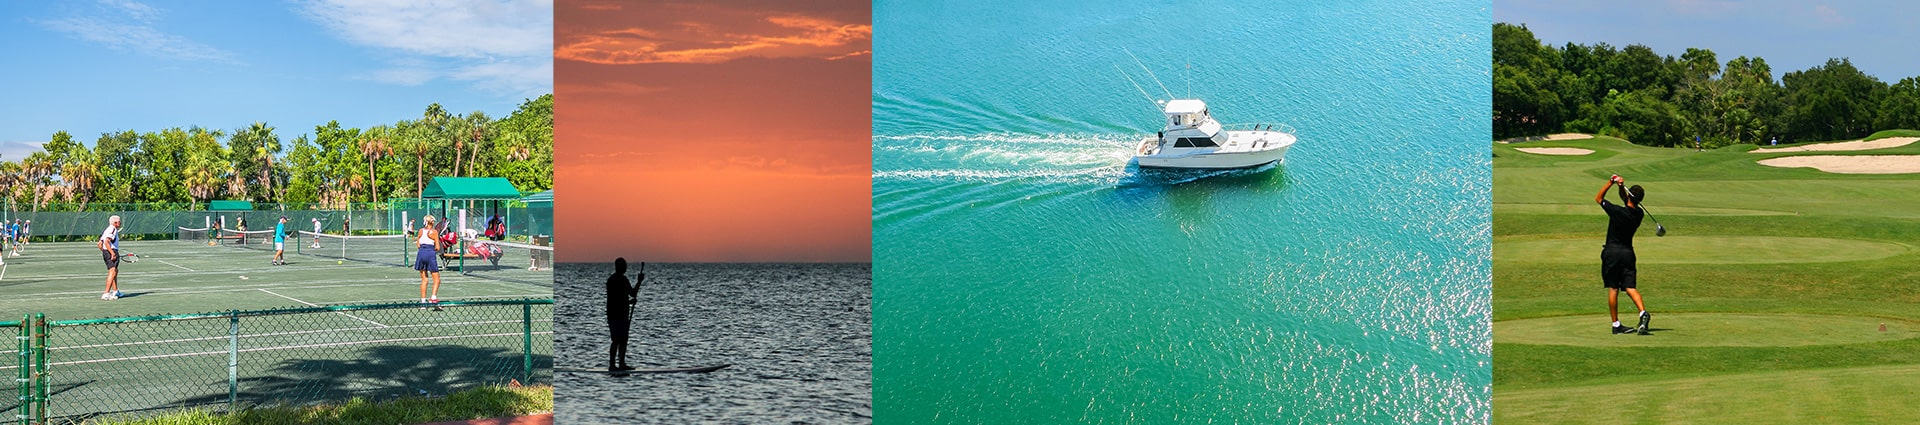 tennis, fishing, boating, golfing images all on longboat key